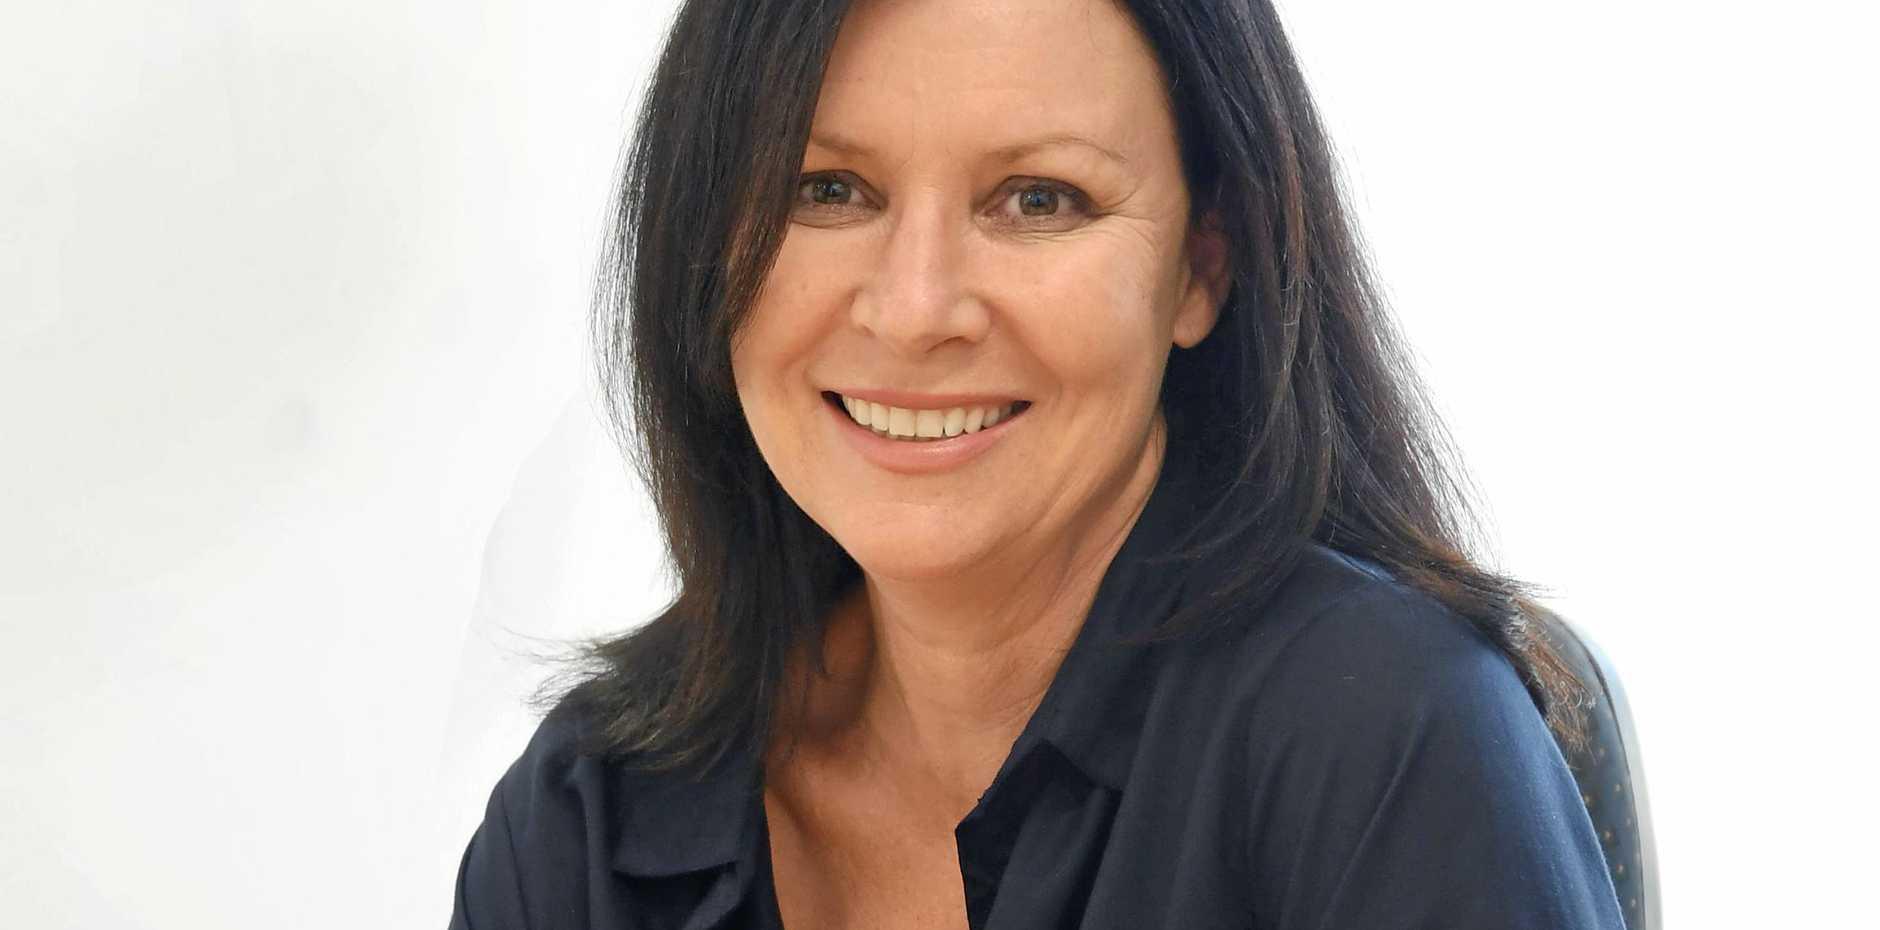 Gympie Times Editor Shelley Strachan